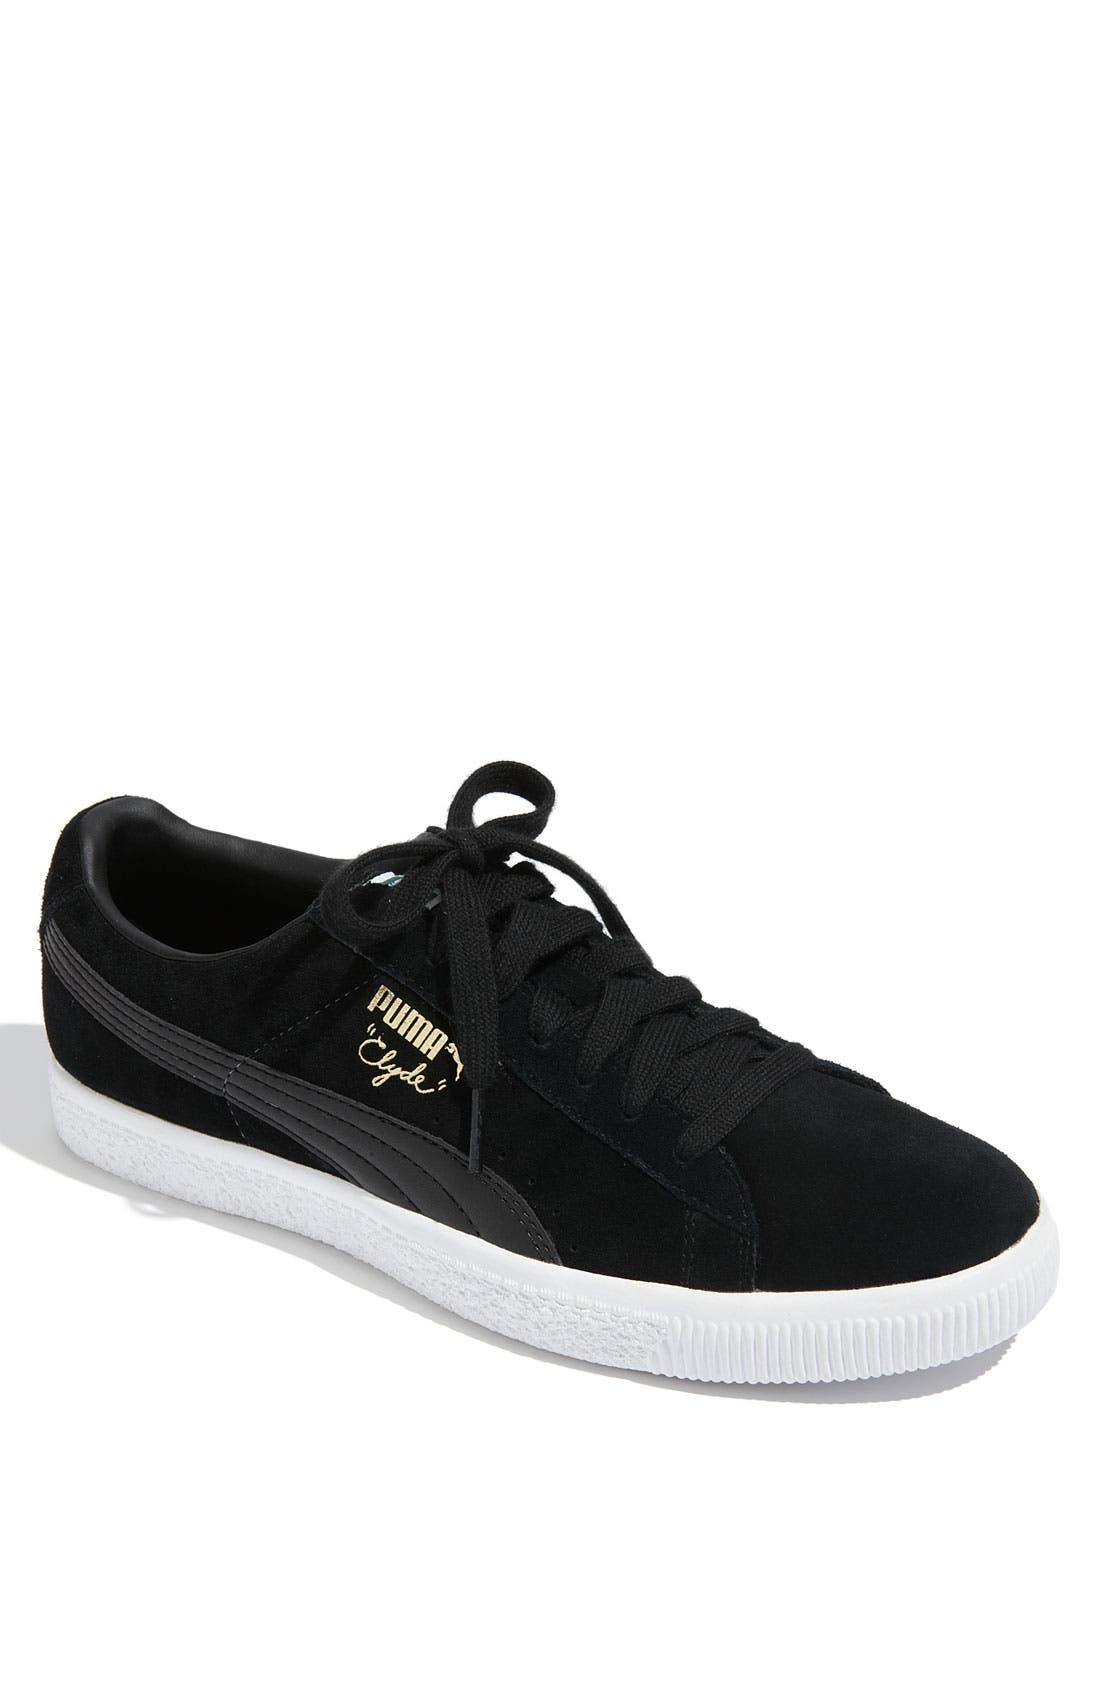 Alternate Image 1 Selected - PUMA 'Clyde Script' Sneaker